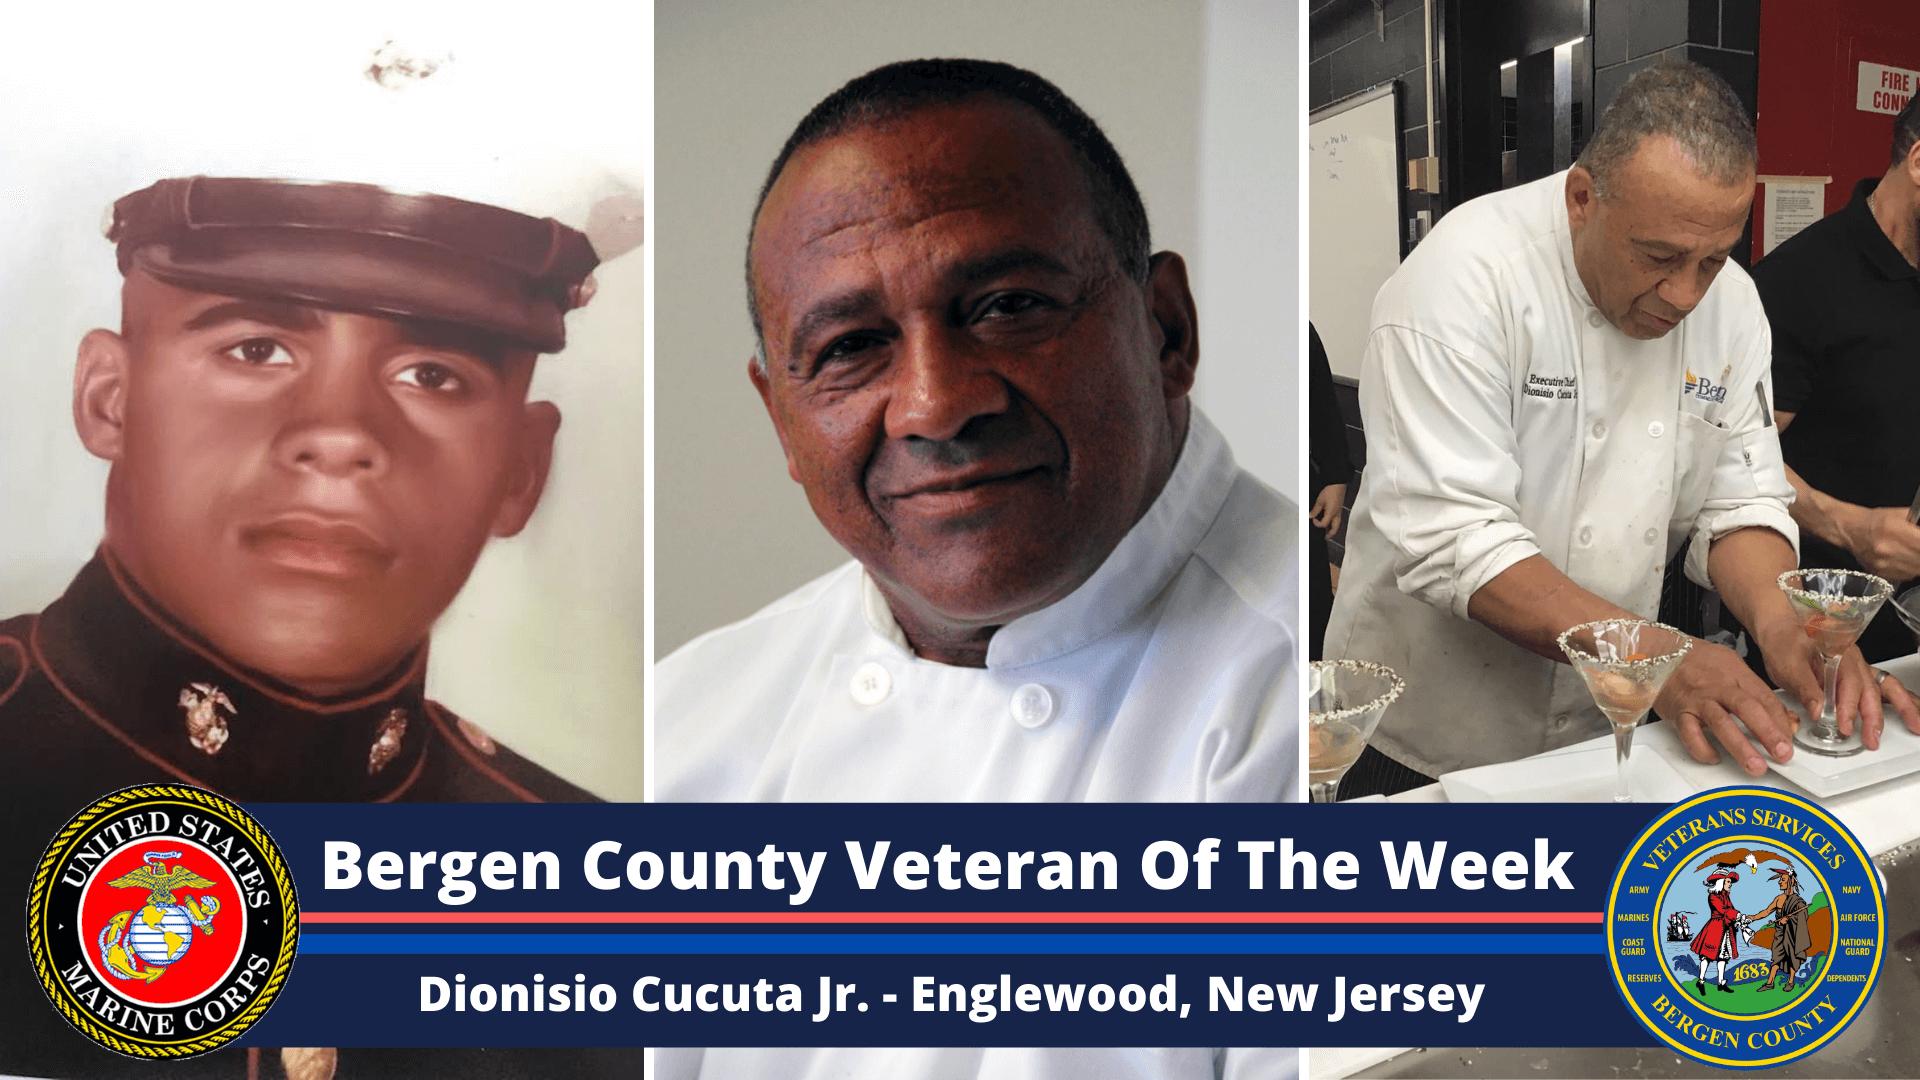 Bergen County Veteran of the Week: Dionisio Cucuta Jr.